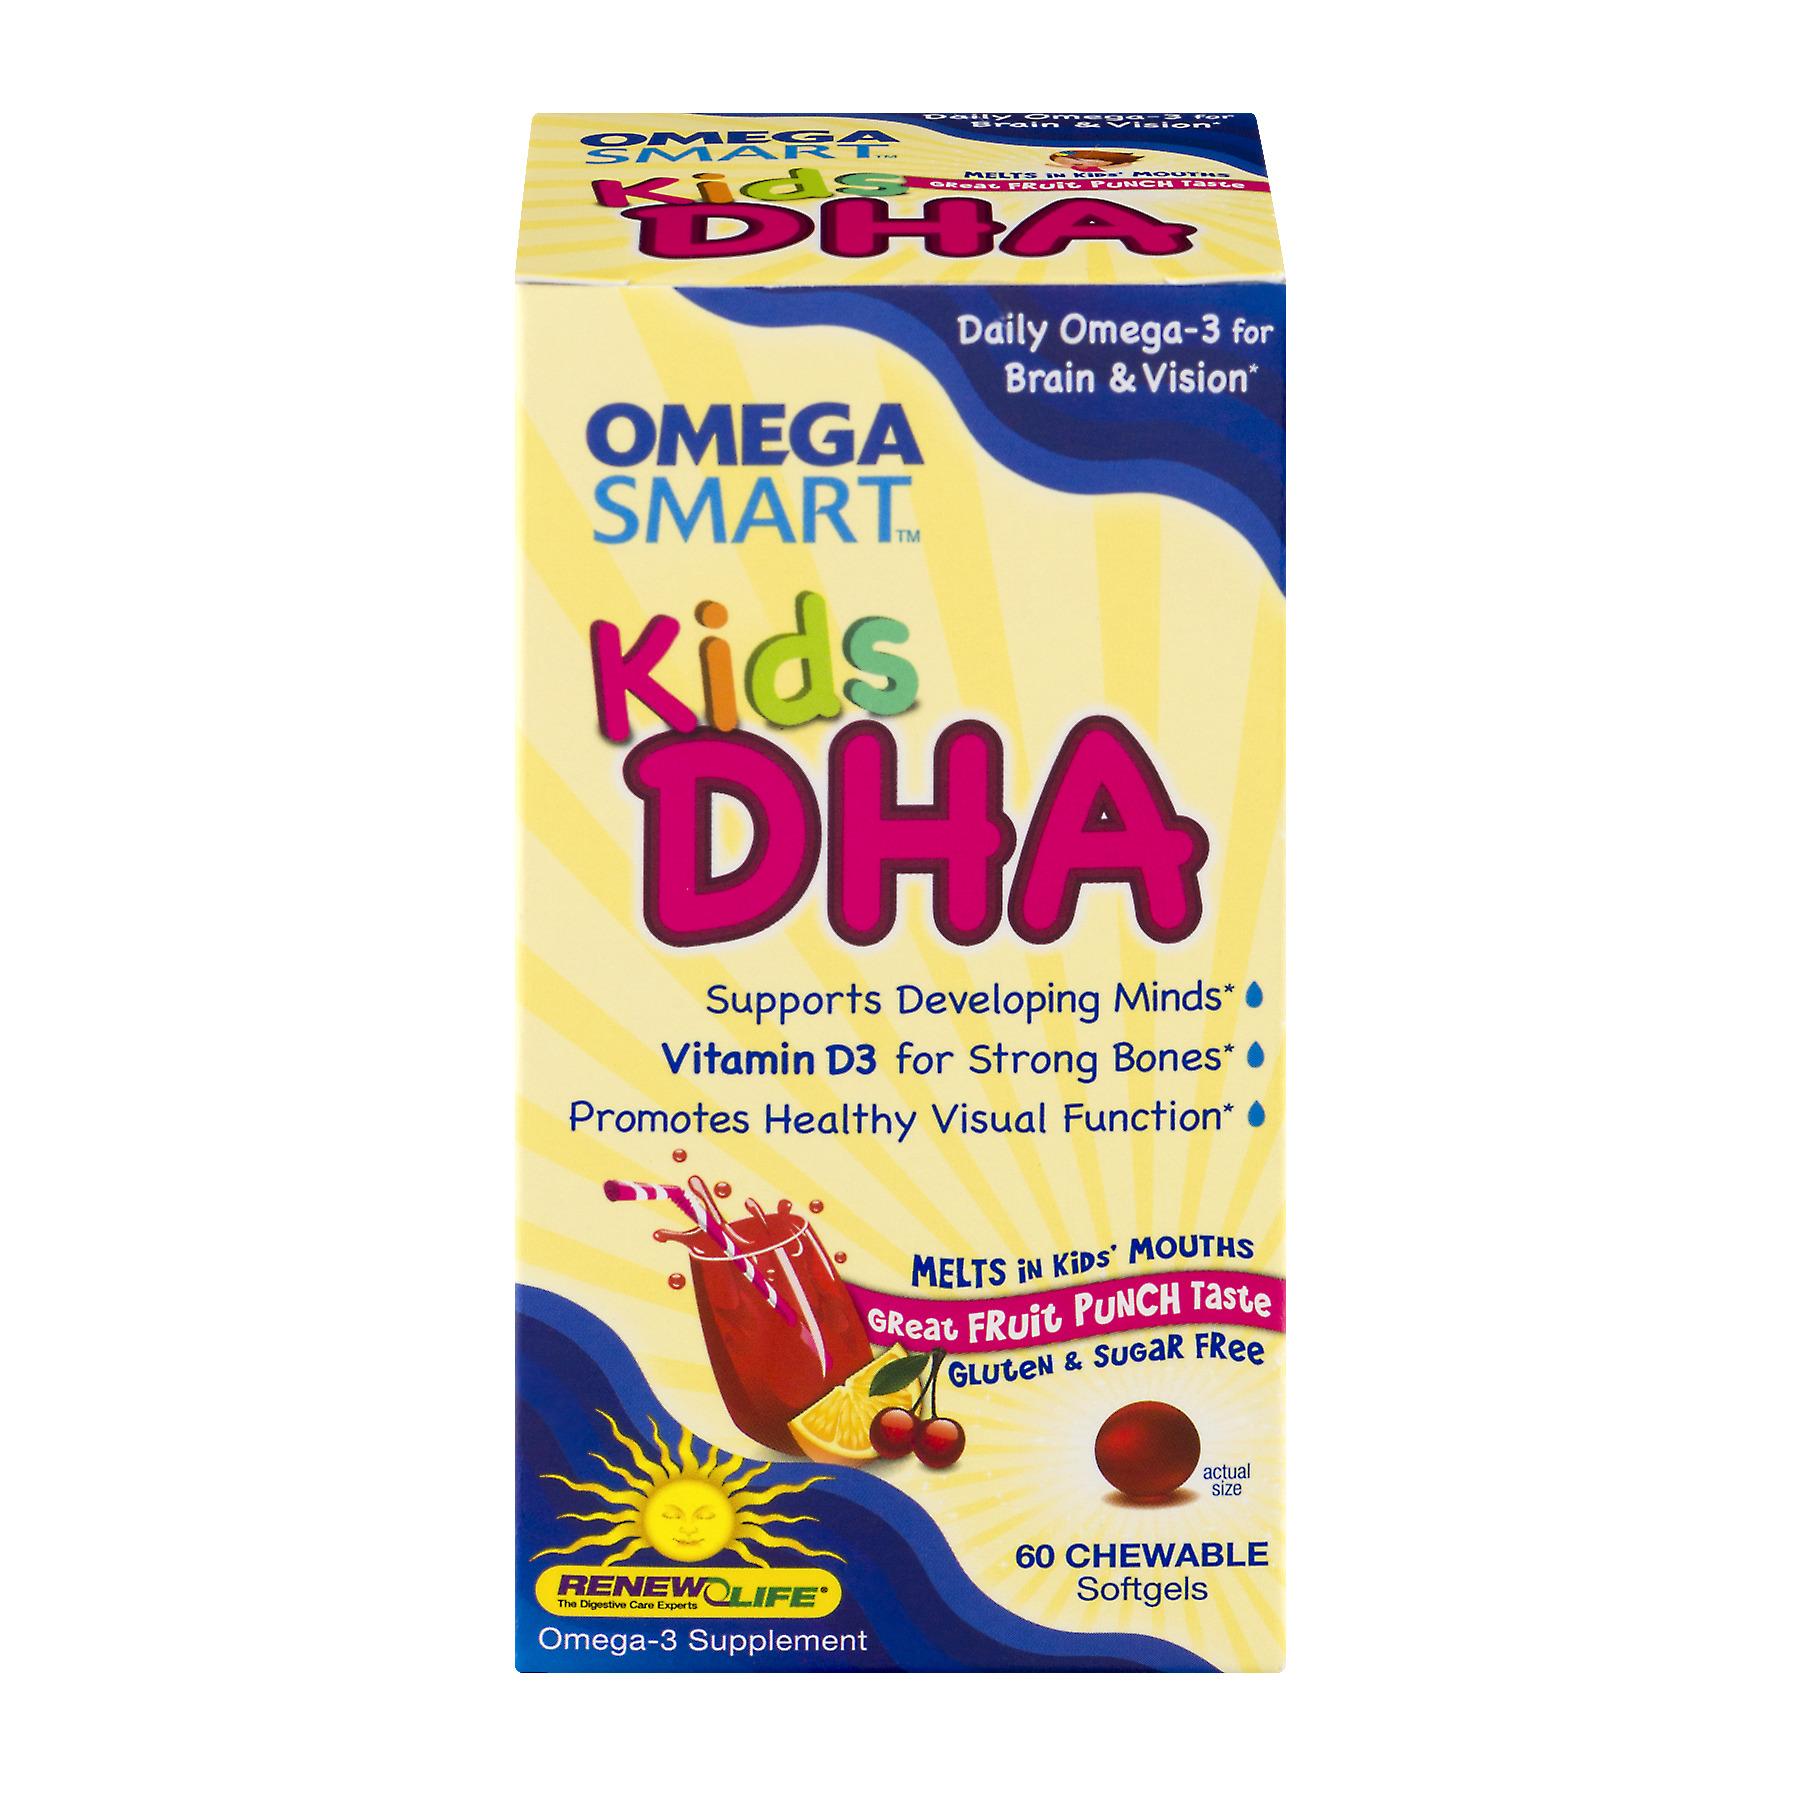 Renew Life Omega Smart Kids DHA Chewable Softgels Fruit Punch - 60 CT